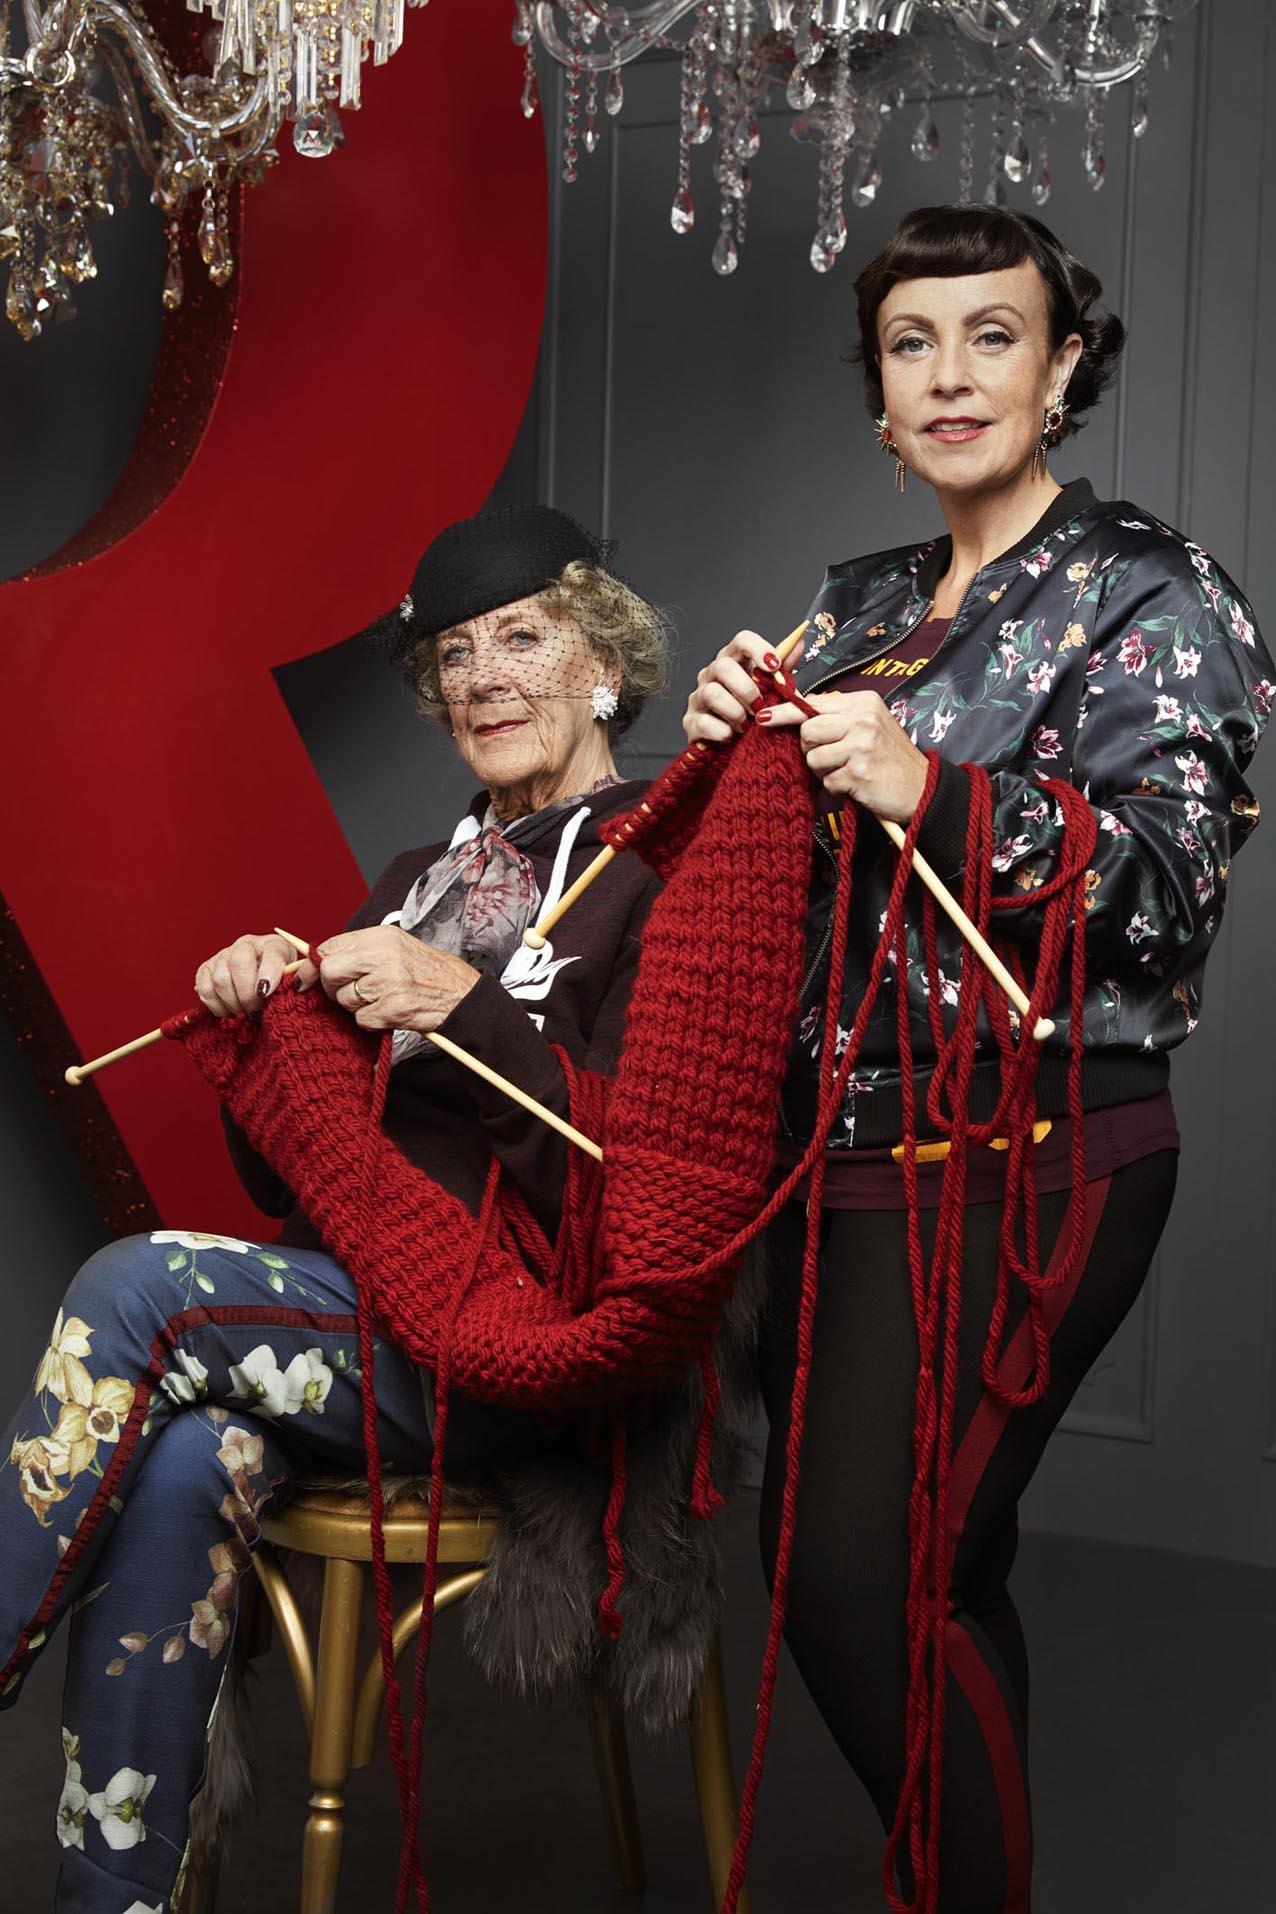 Inger og Rikke poserer for Rødovre Centrum.